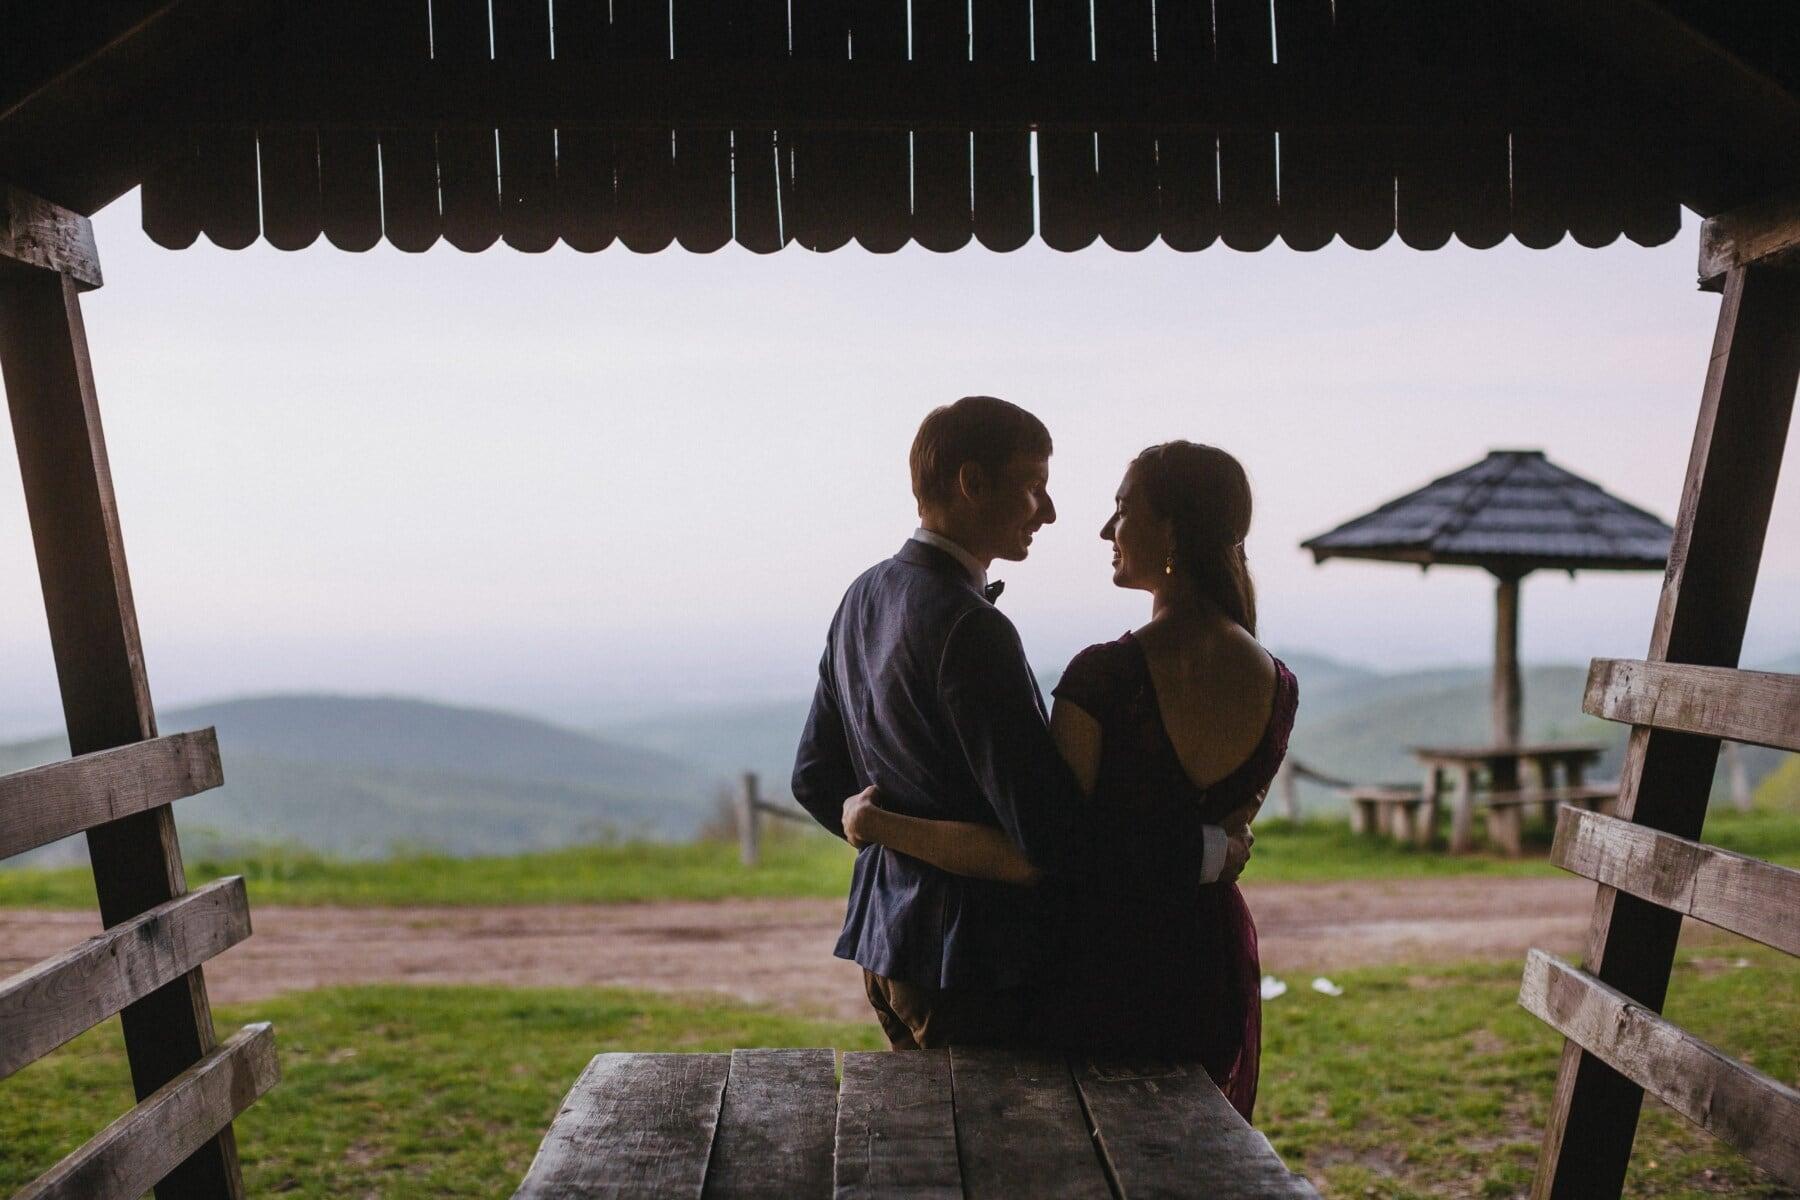 cottage, love date, affection, boyfriend, girlfriend, hugging, woman, girl, person, people